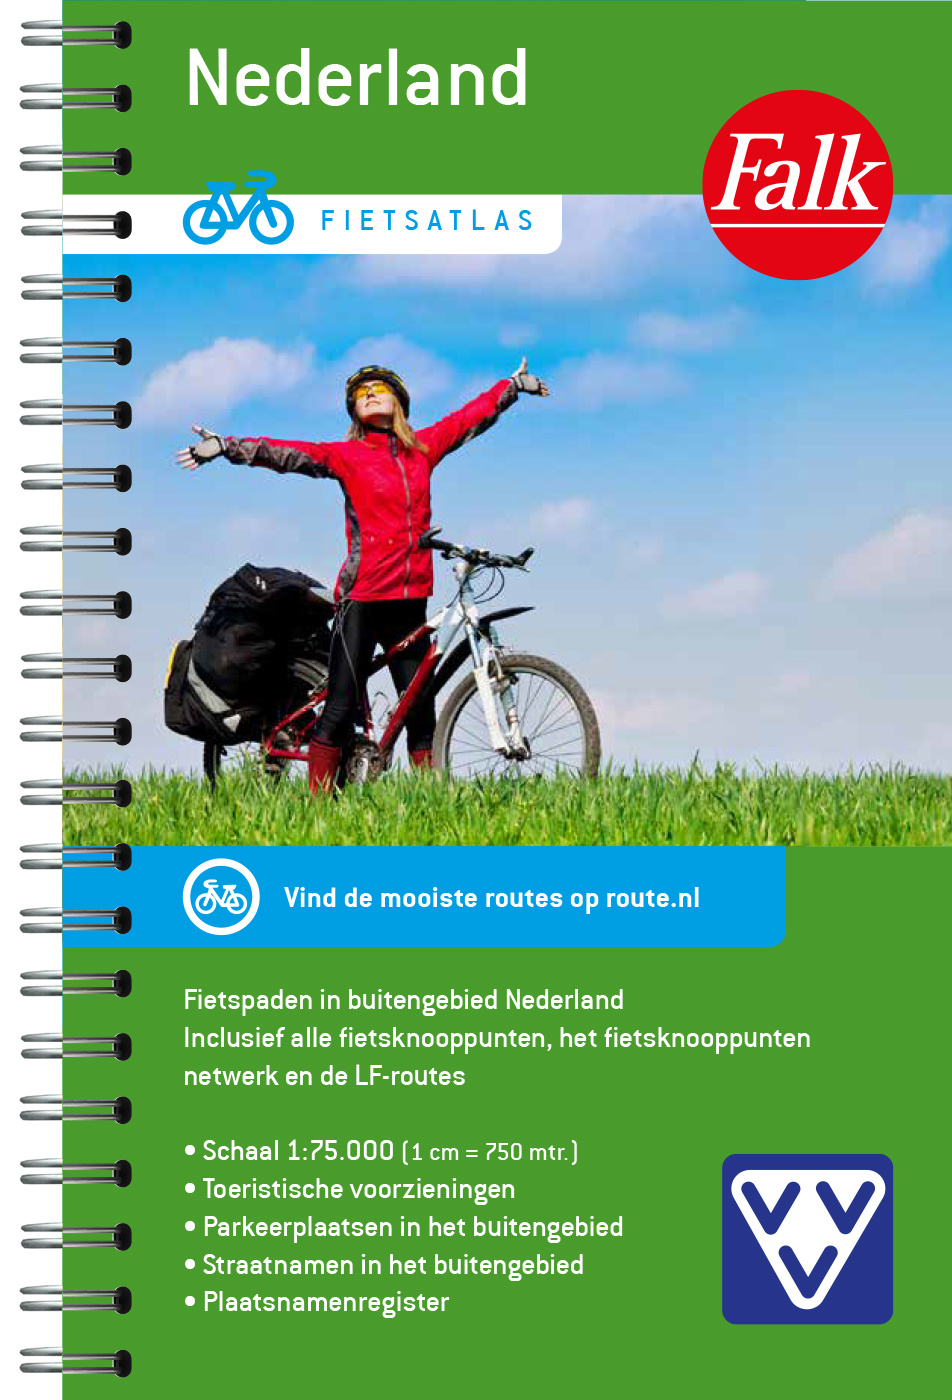 Falk Fietsatlas Nederland 2021, picture 359198228